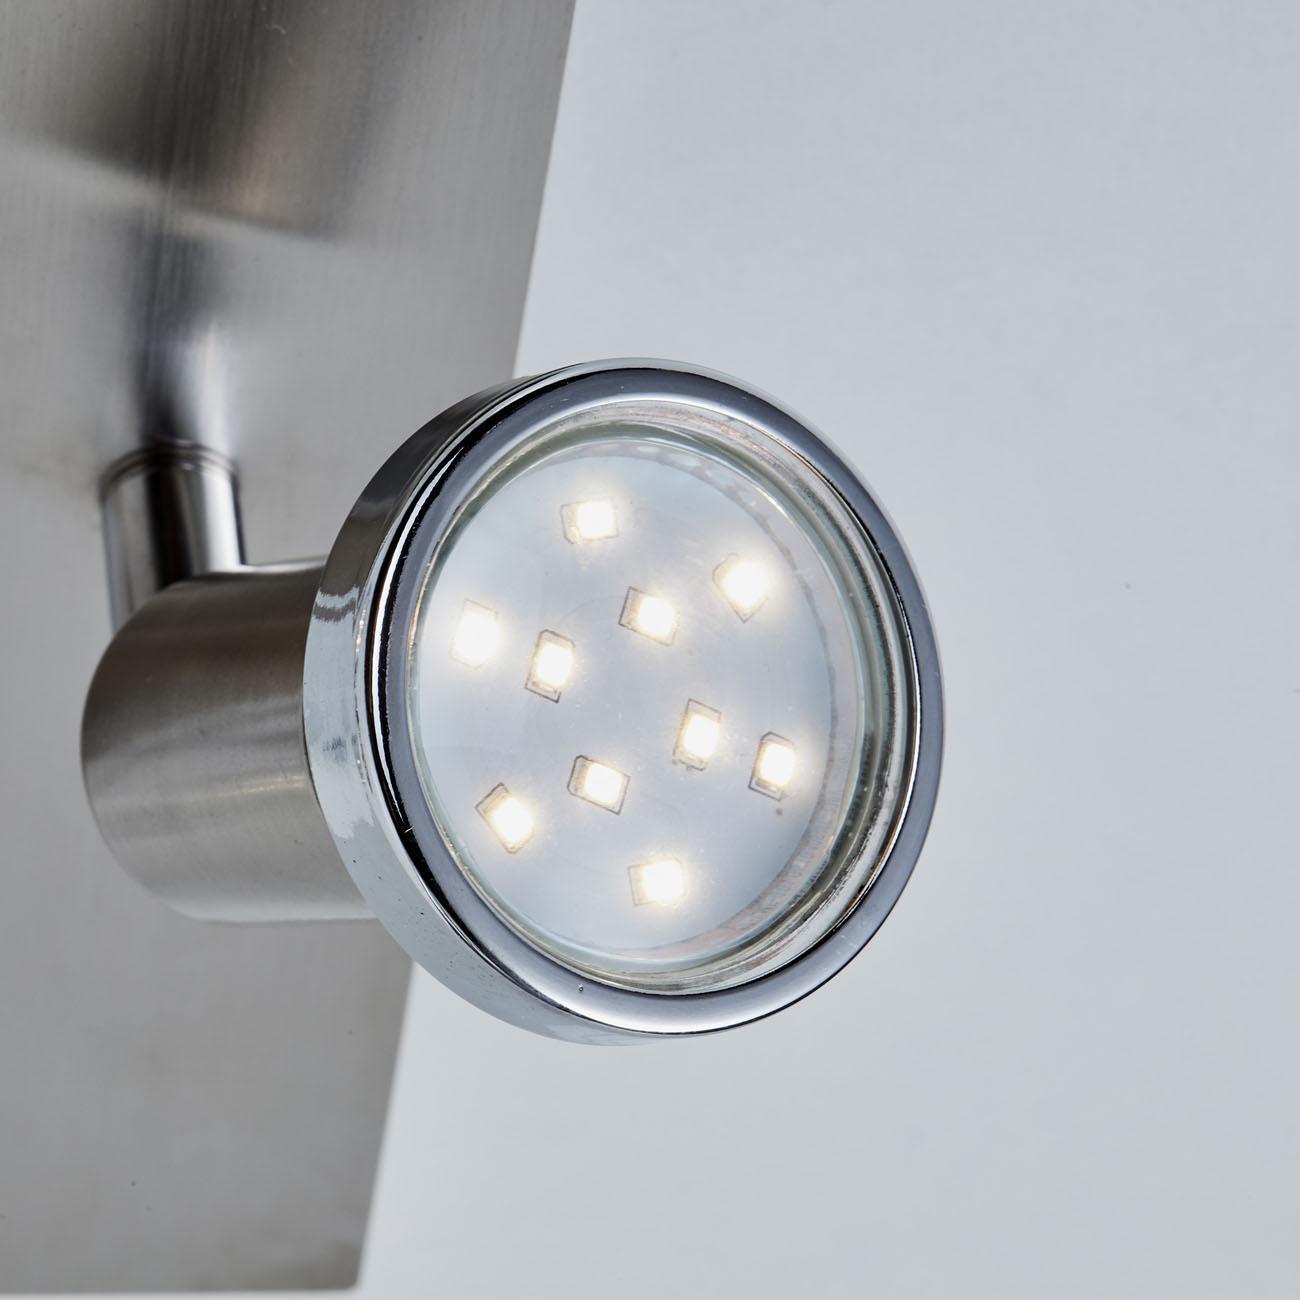 LED Kombi Deckenleuchte Spotleuchte 4-flammig  - 5